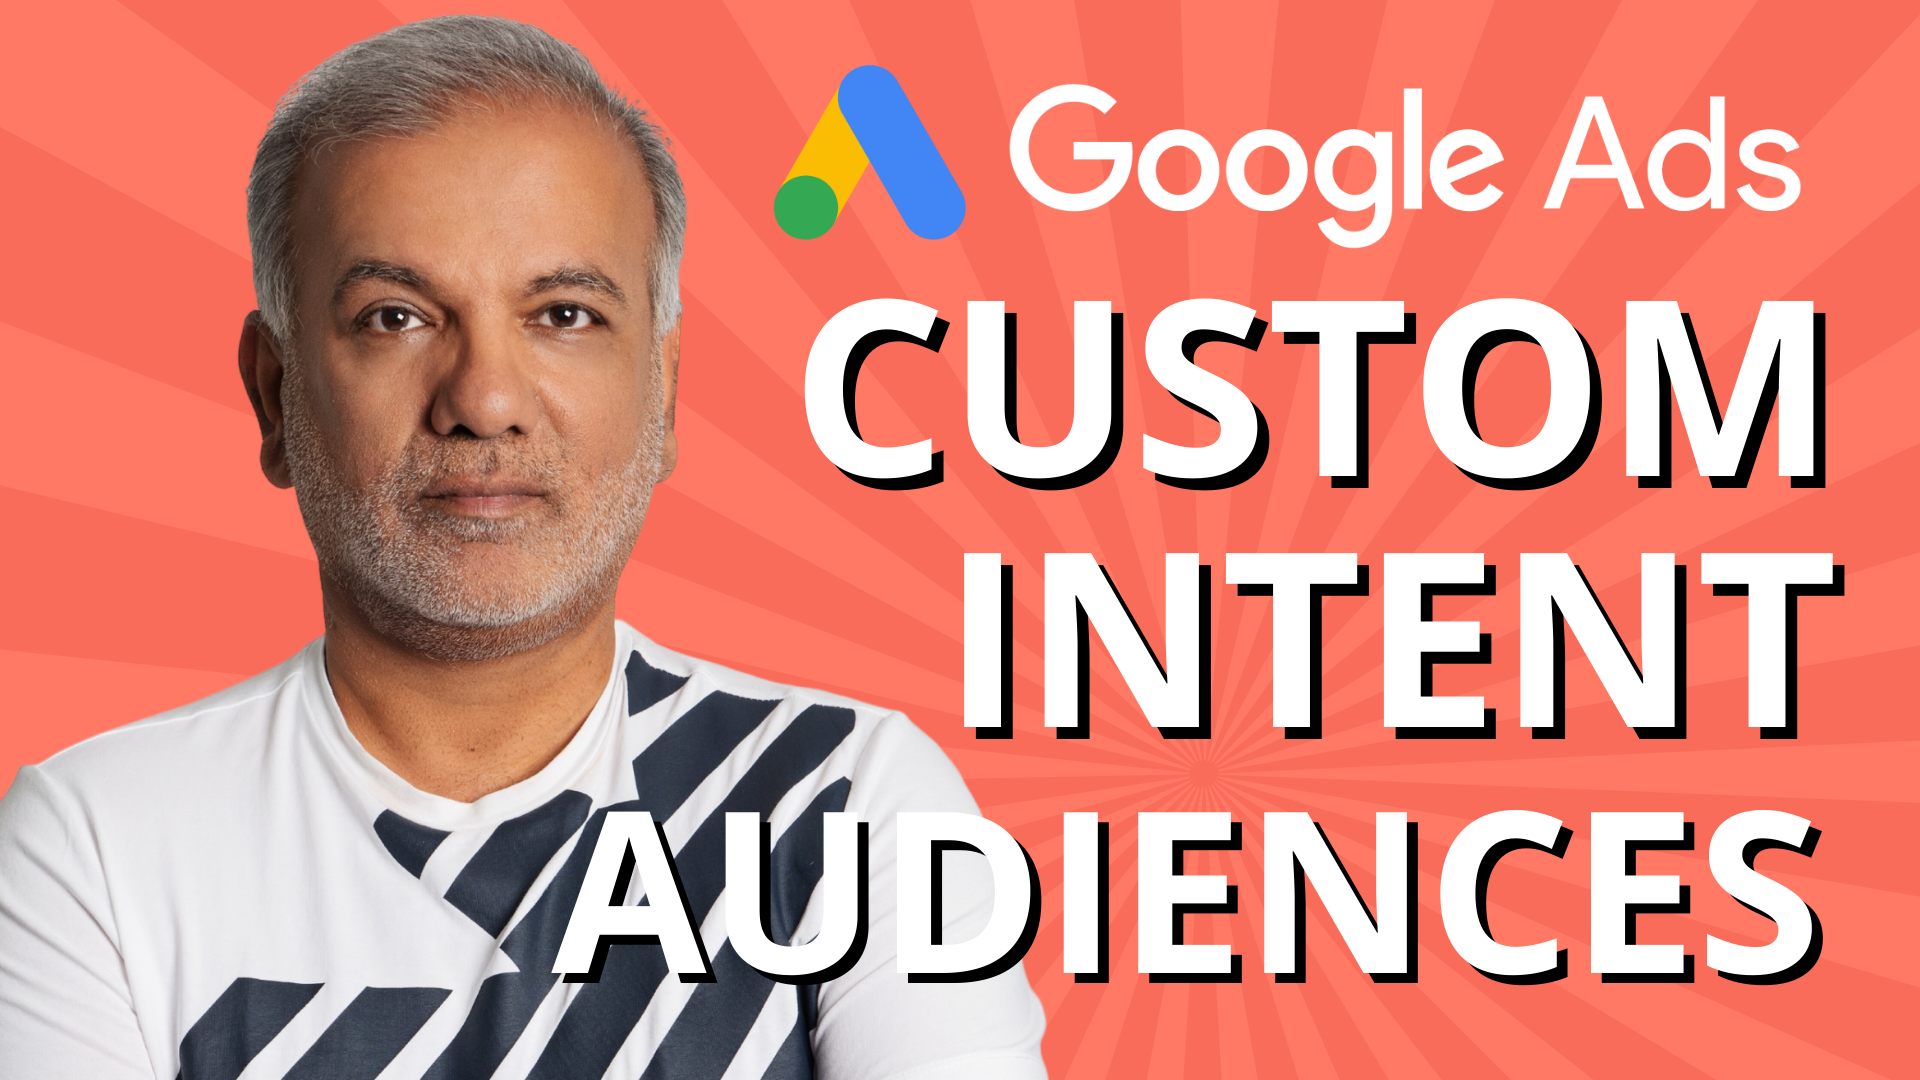 Google Ads Custom Intent Audiences